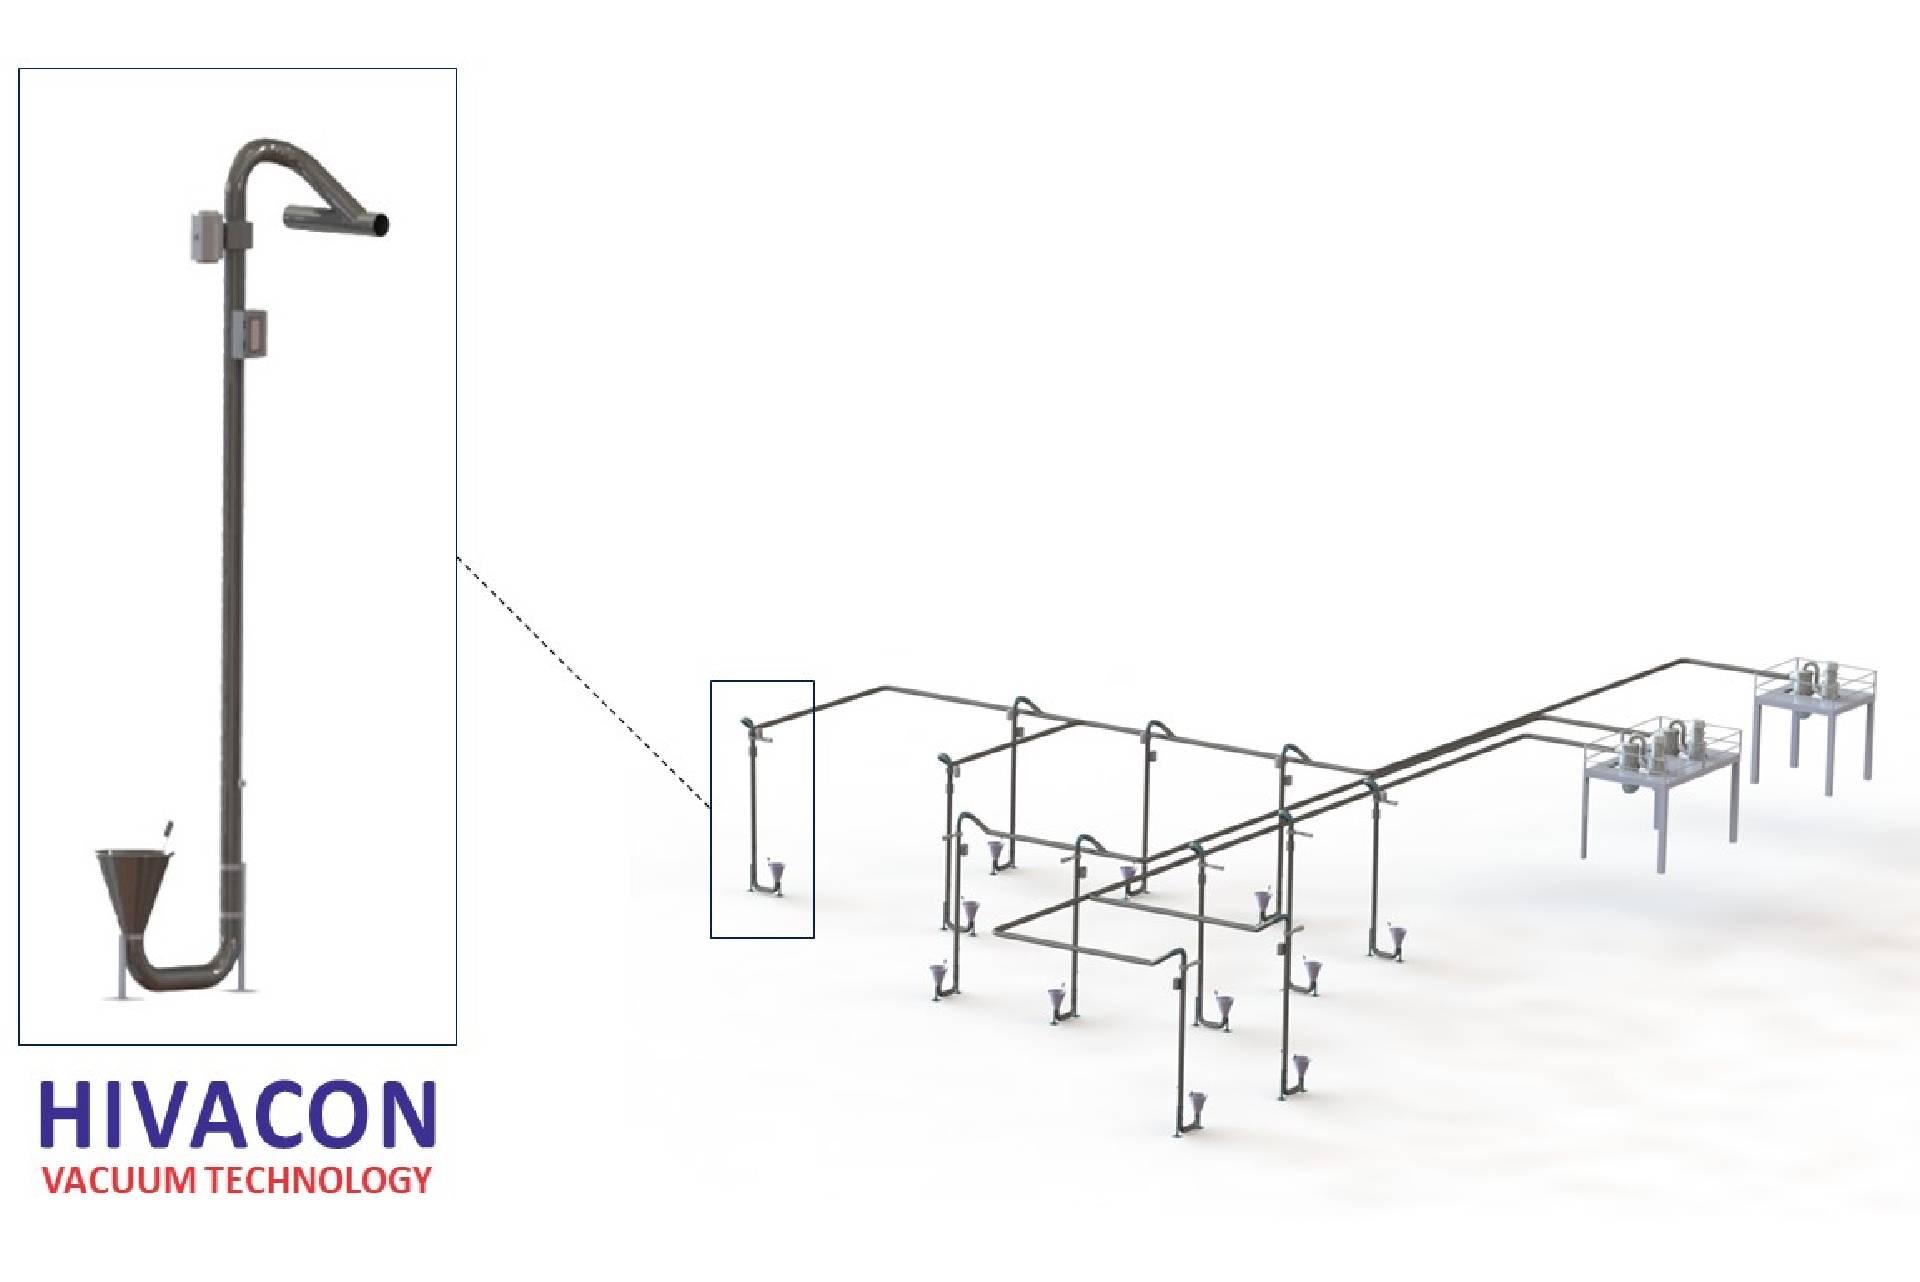 Hivacon serves customers internationally